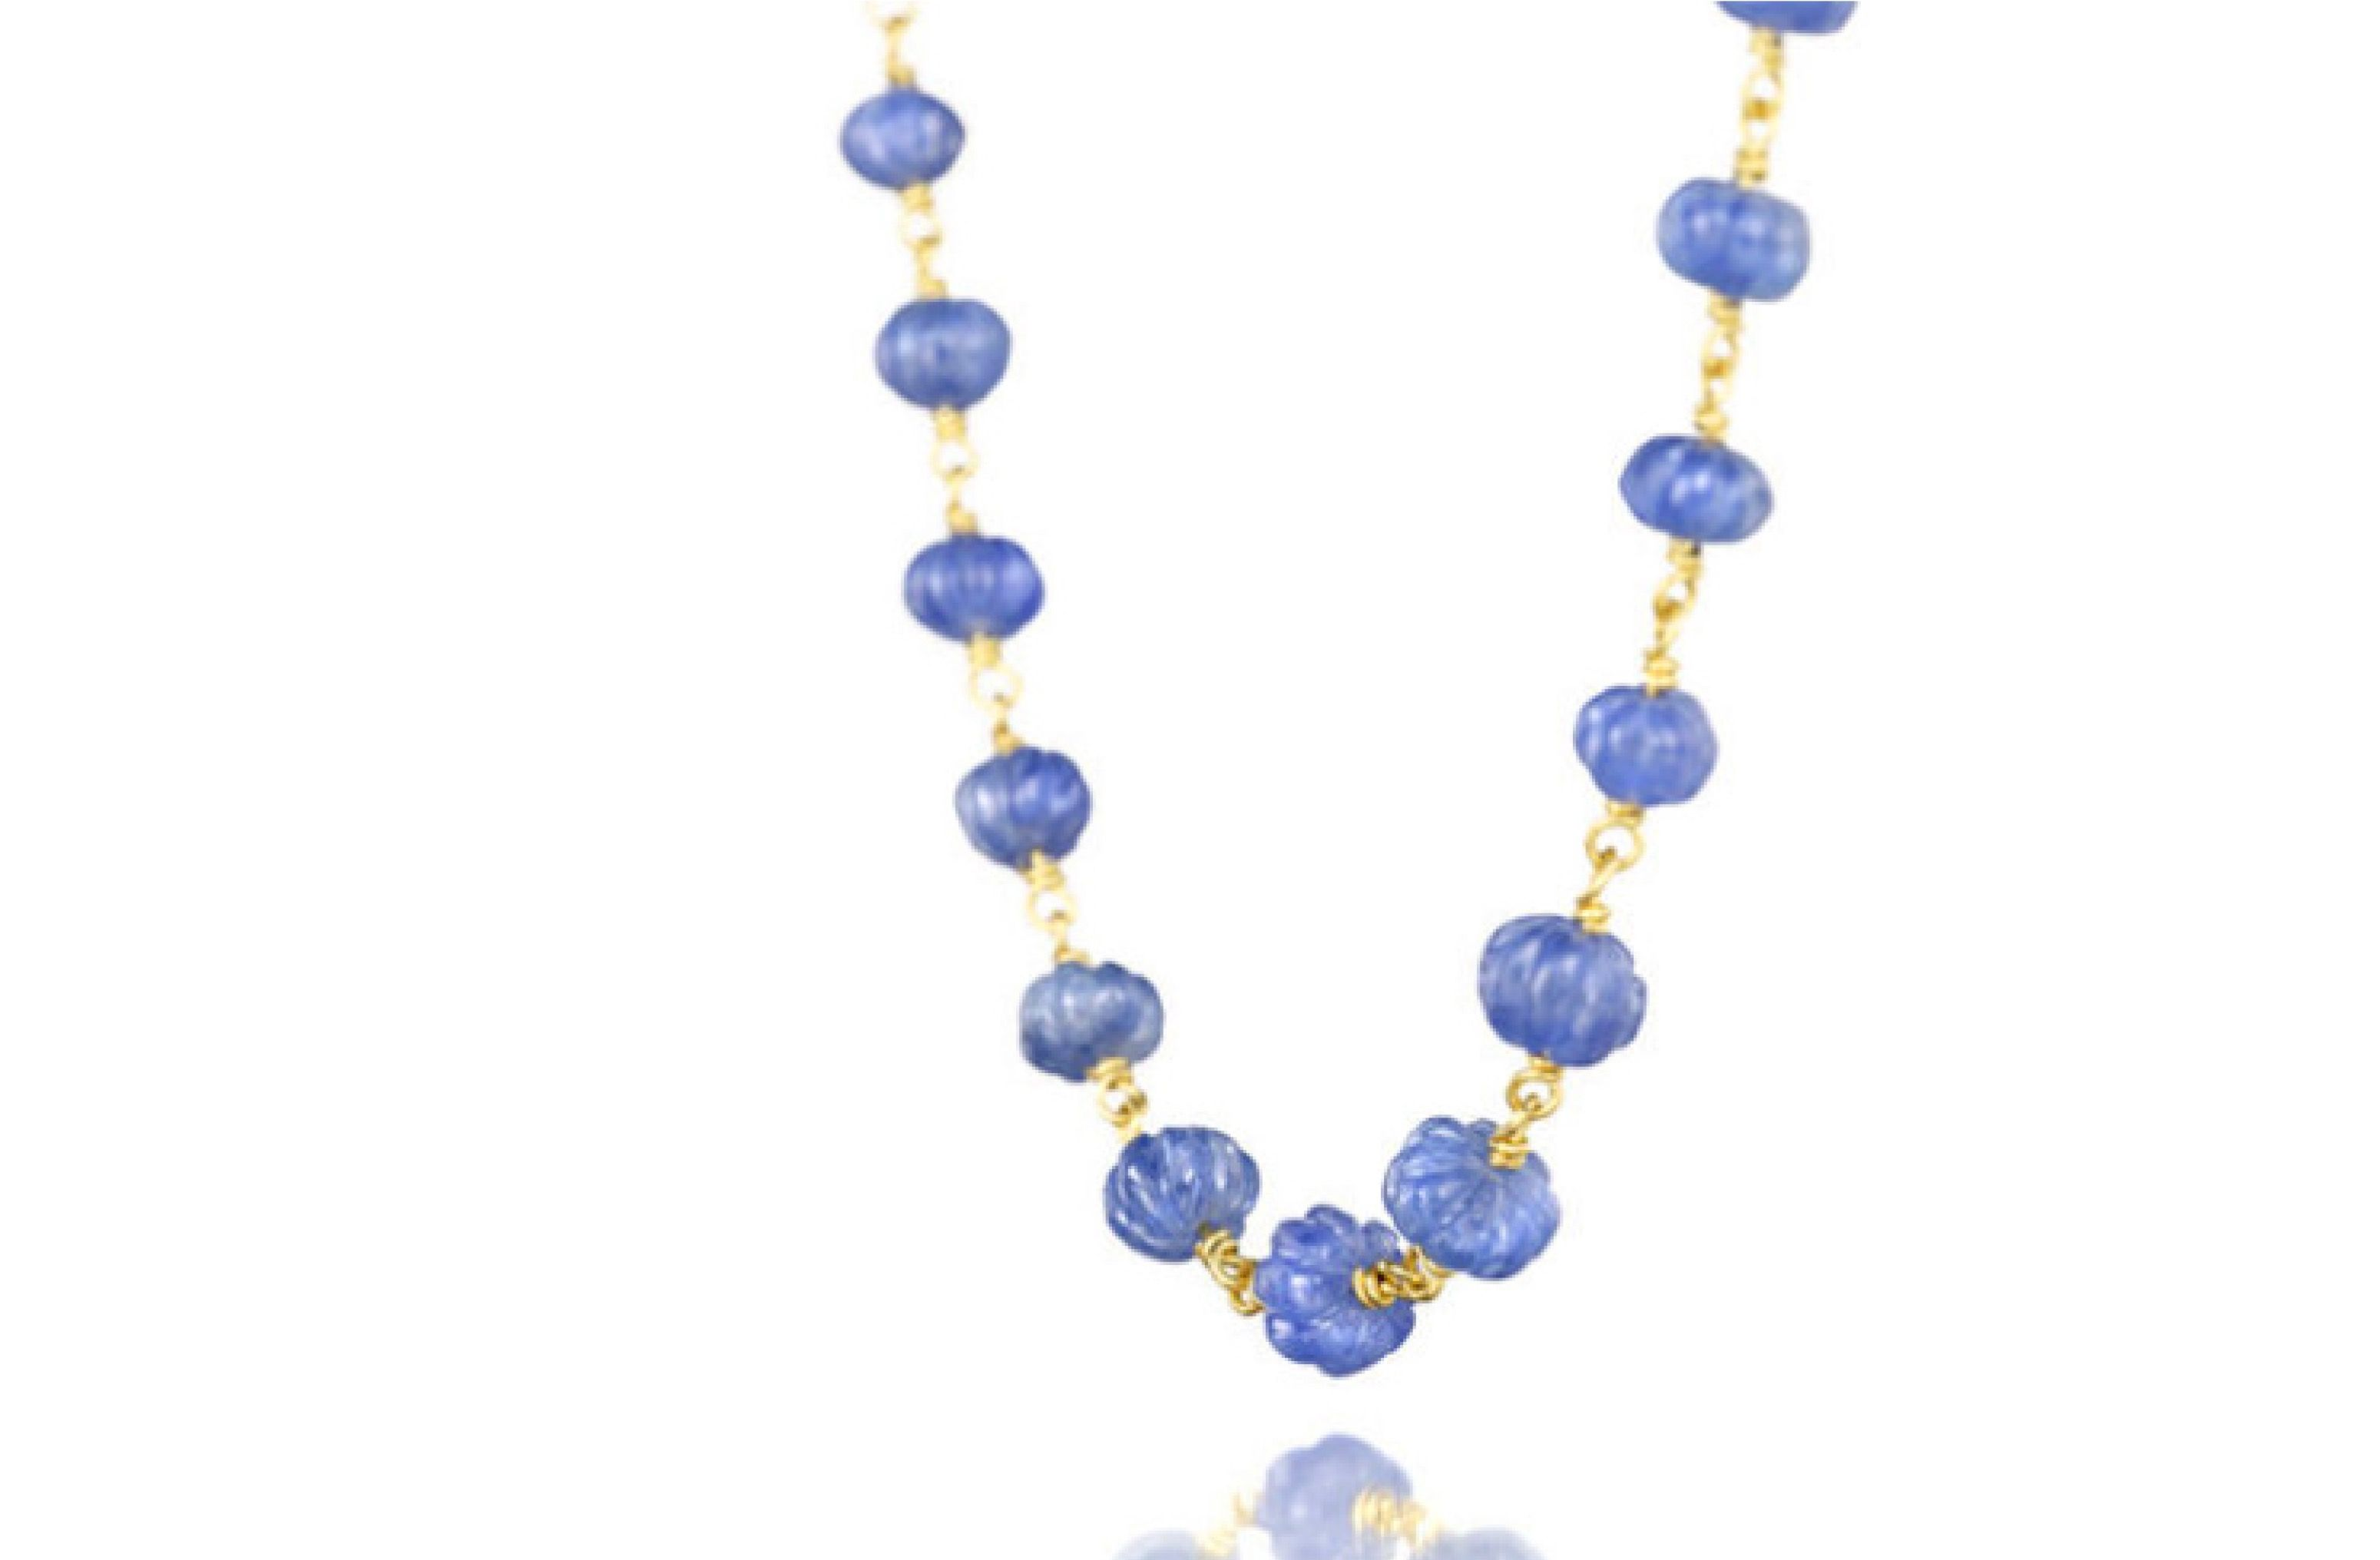 JewelryWhite_20.jpg